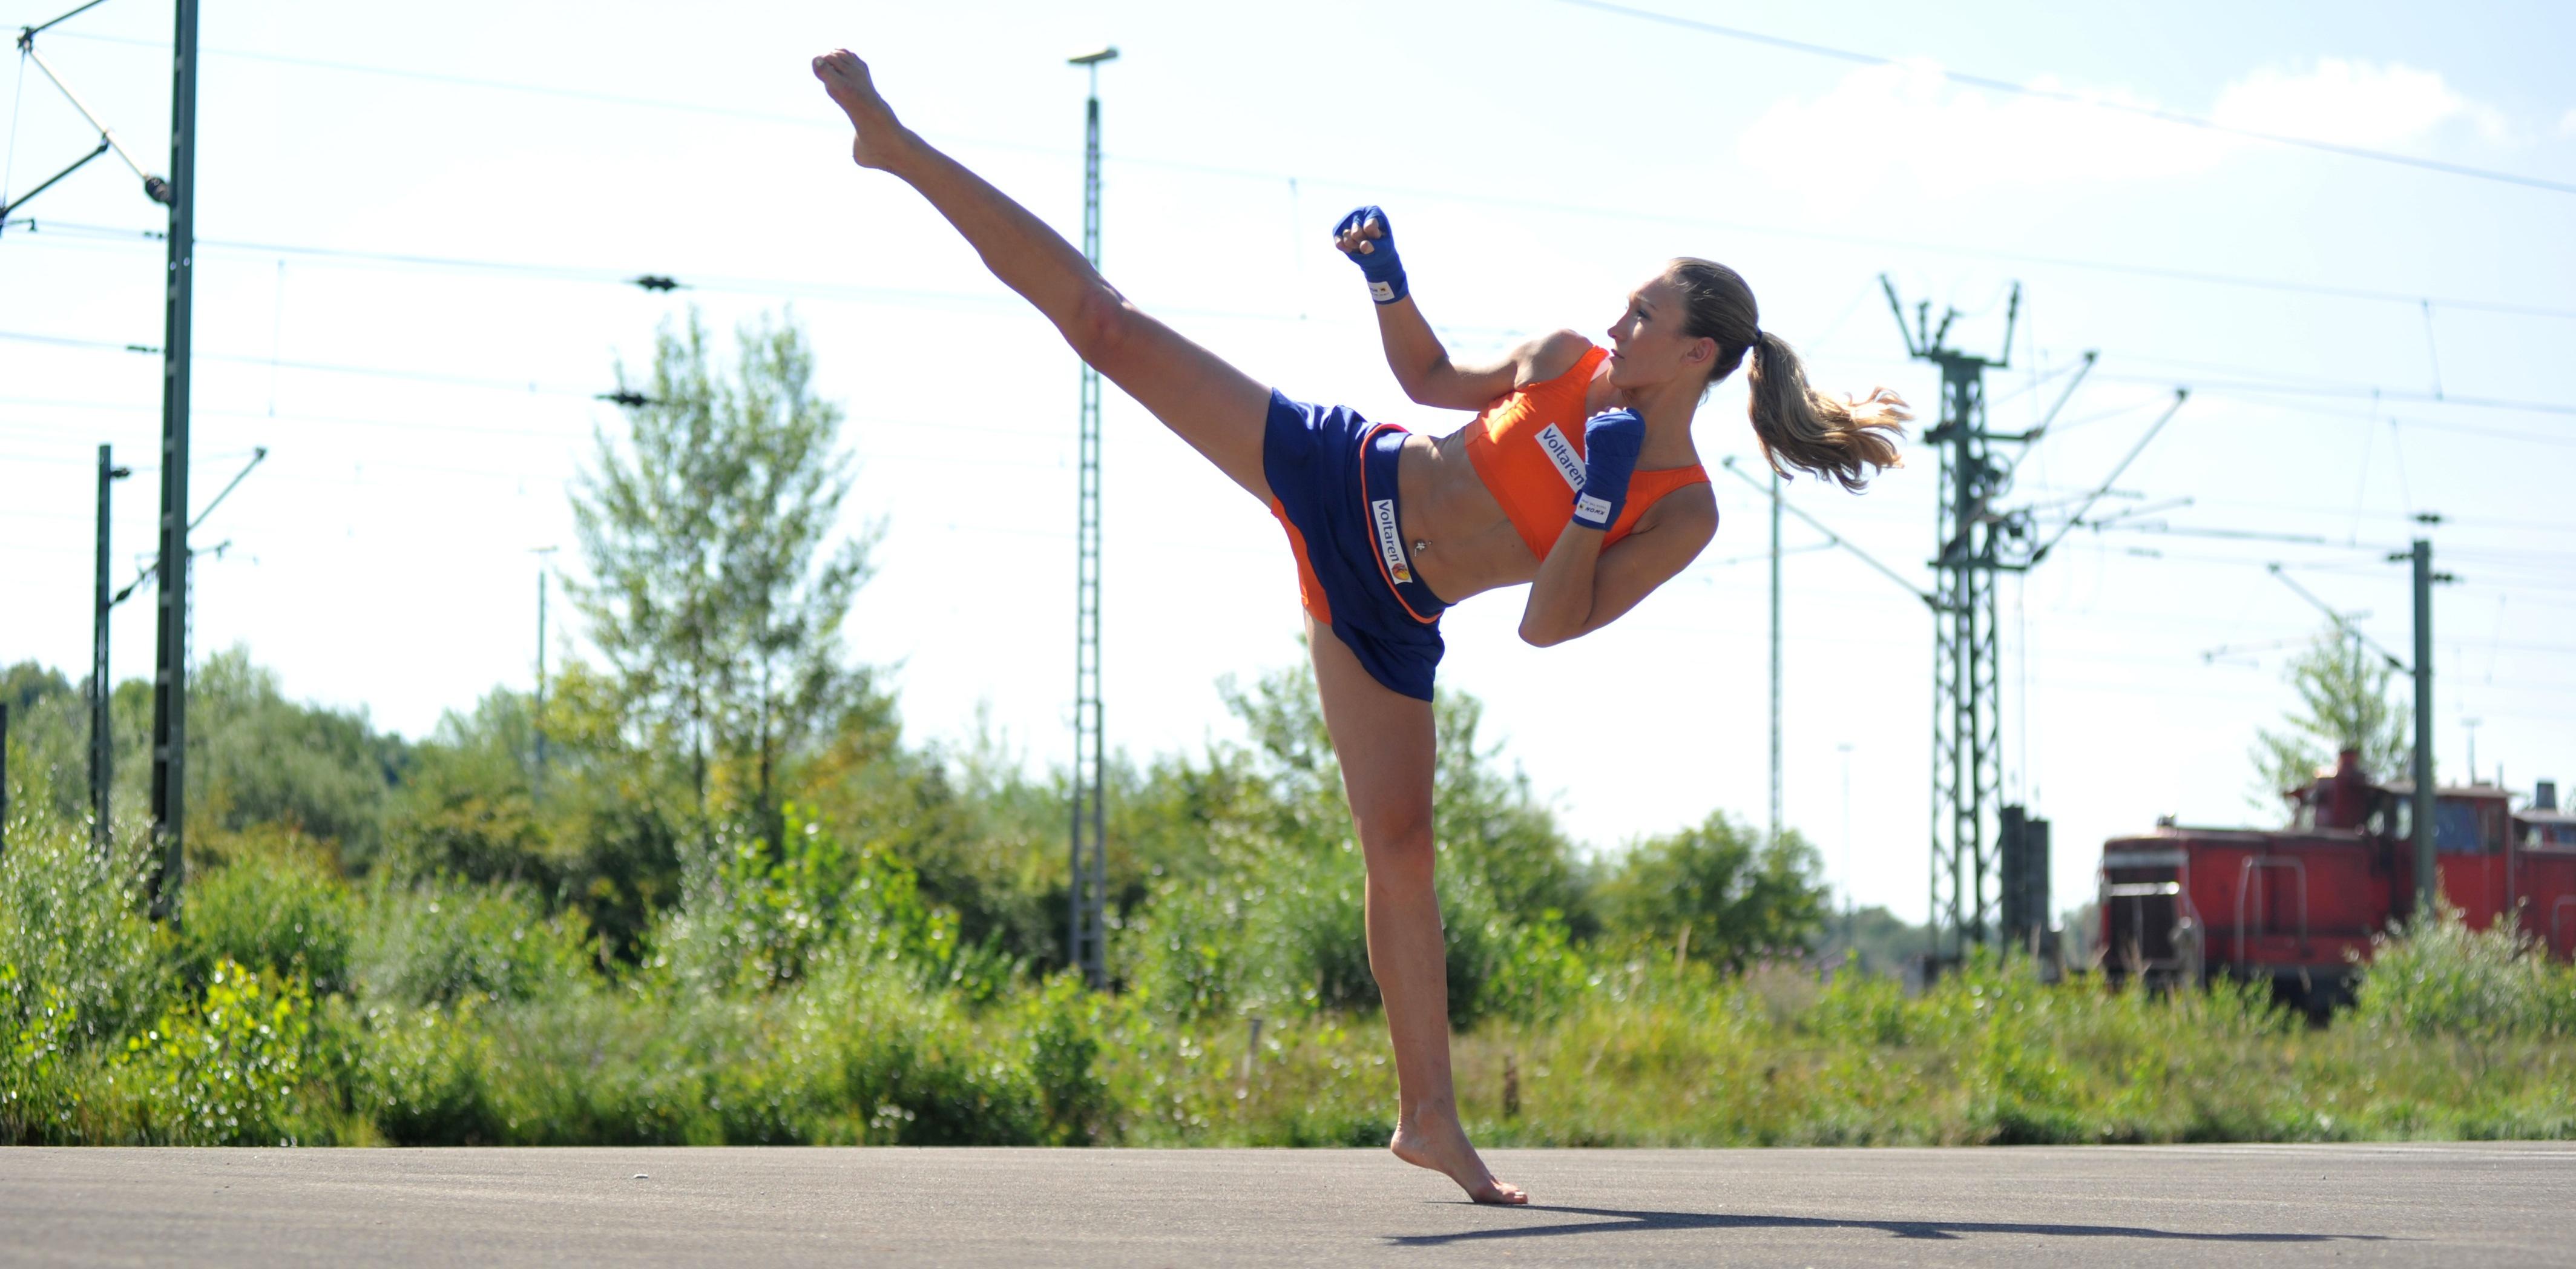 Christine Theiss Kickbox Photoshoot 2010 09